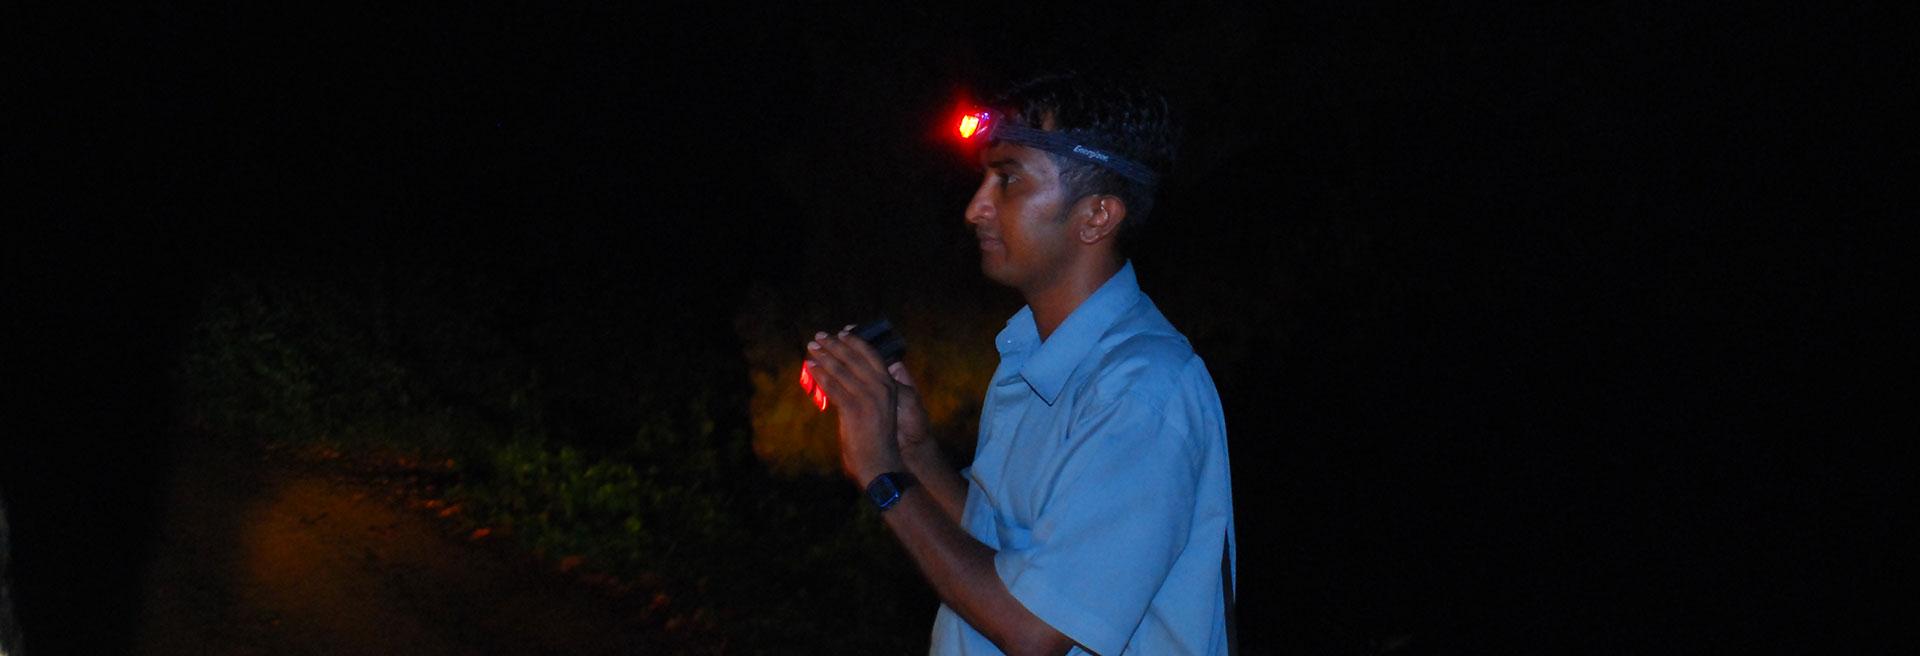 Loris night trail